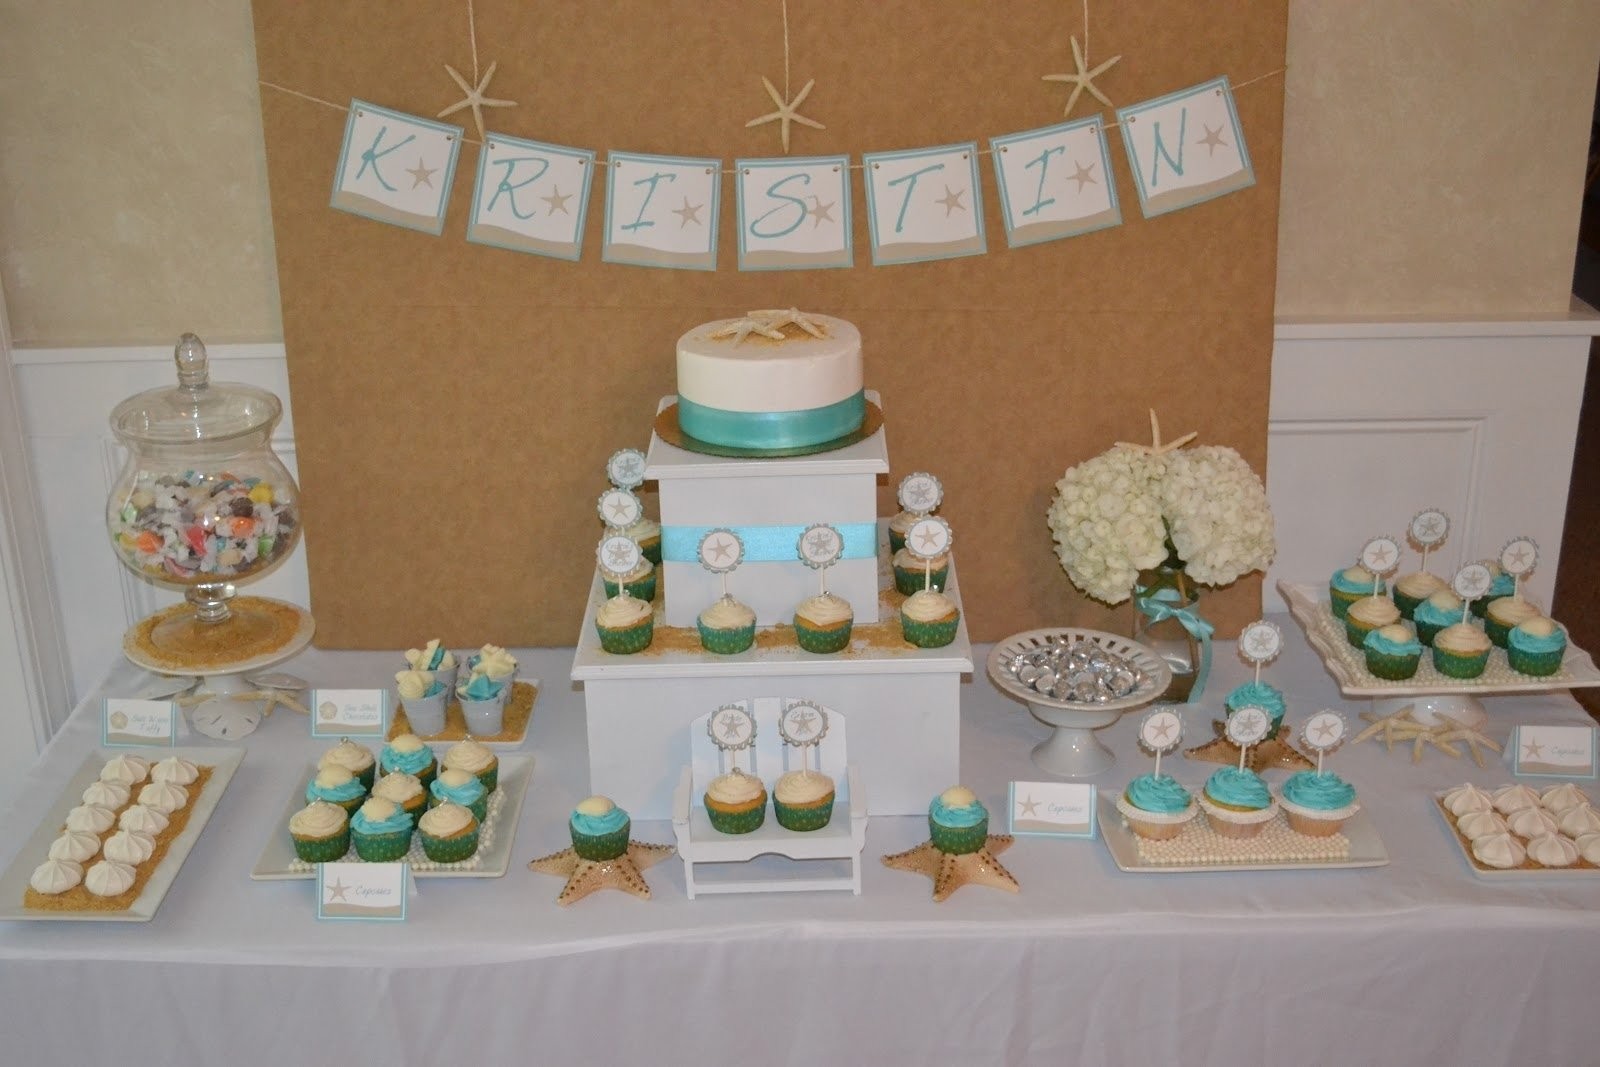 10 Most Popular Beach Themed Bridal Shower Ideas tbdress blog ideas for beach themed wedding shower 1 2020